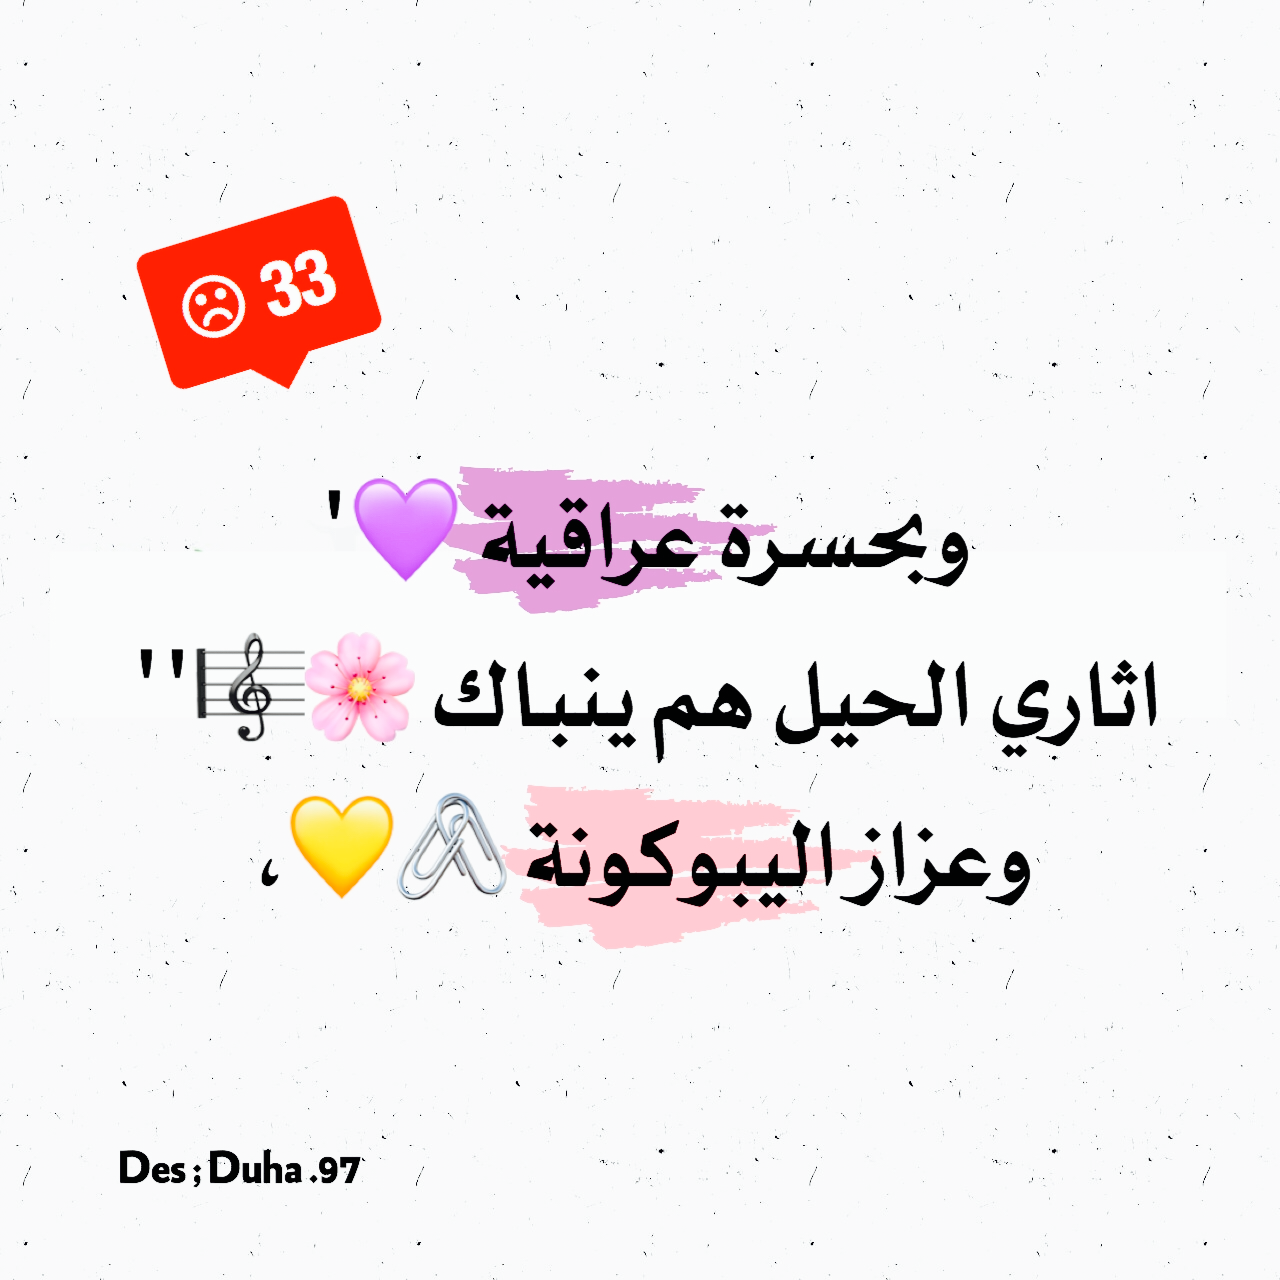 Pin By گرزآيهہ On رمزيات Arabic Calligraphy Poetry